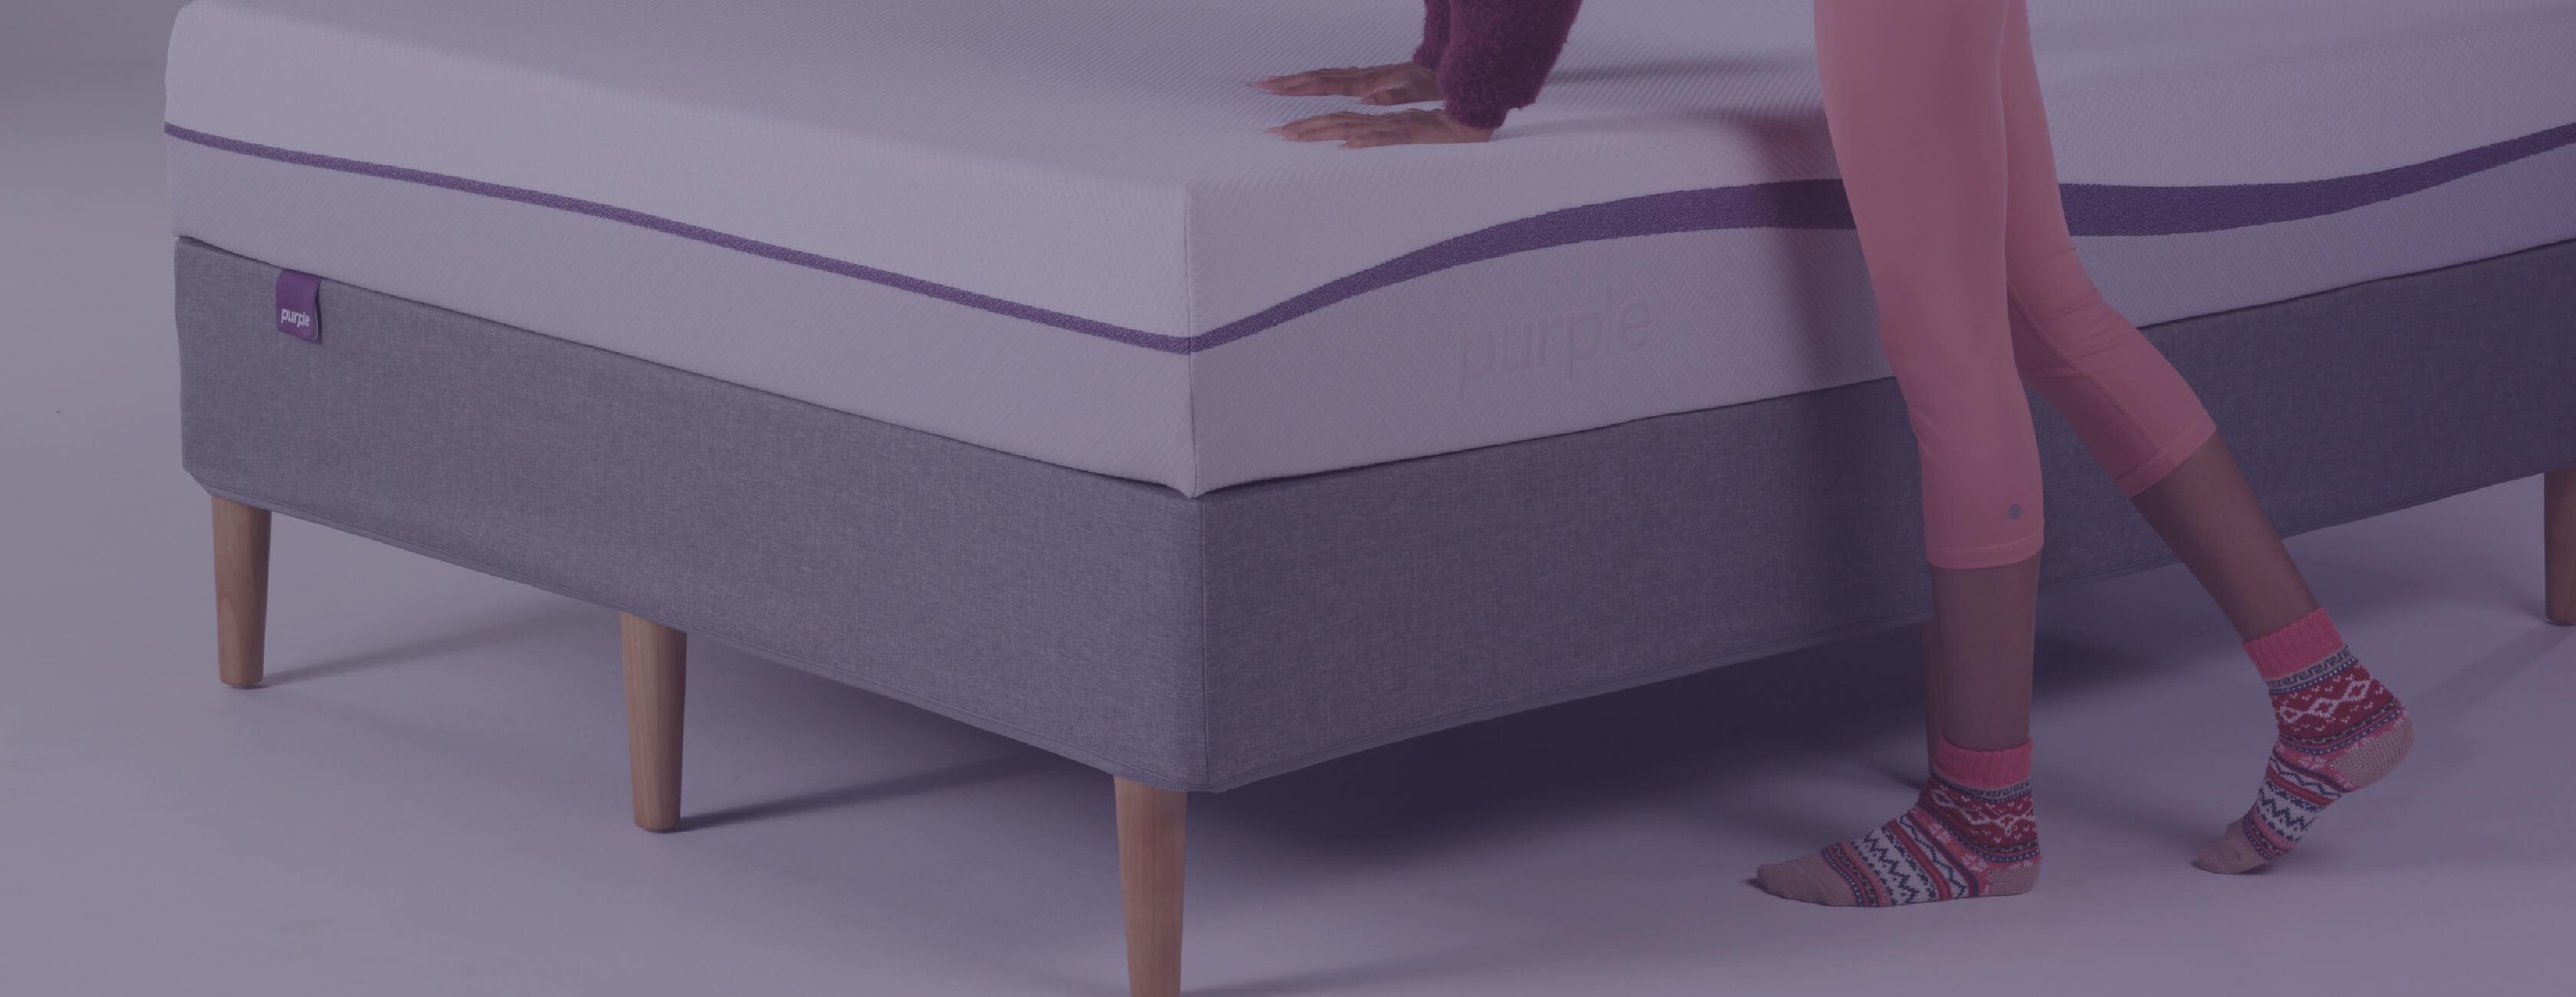 Bed Frames Purple